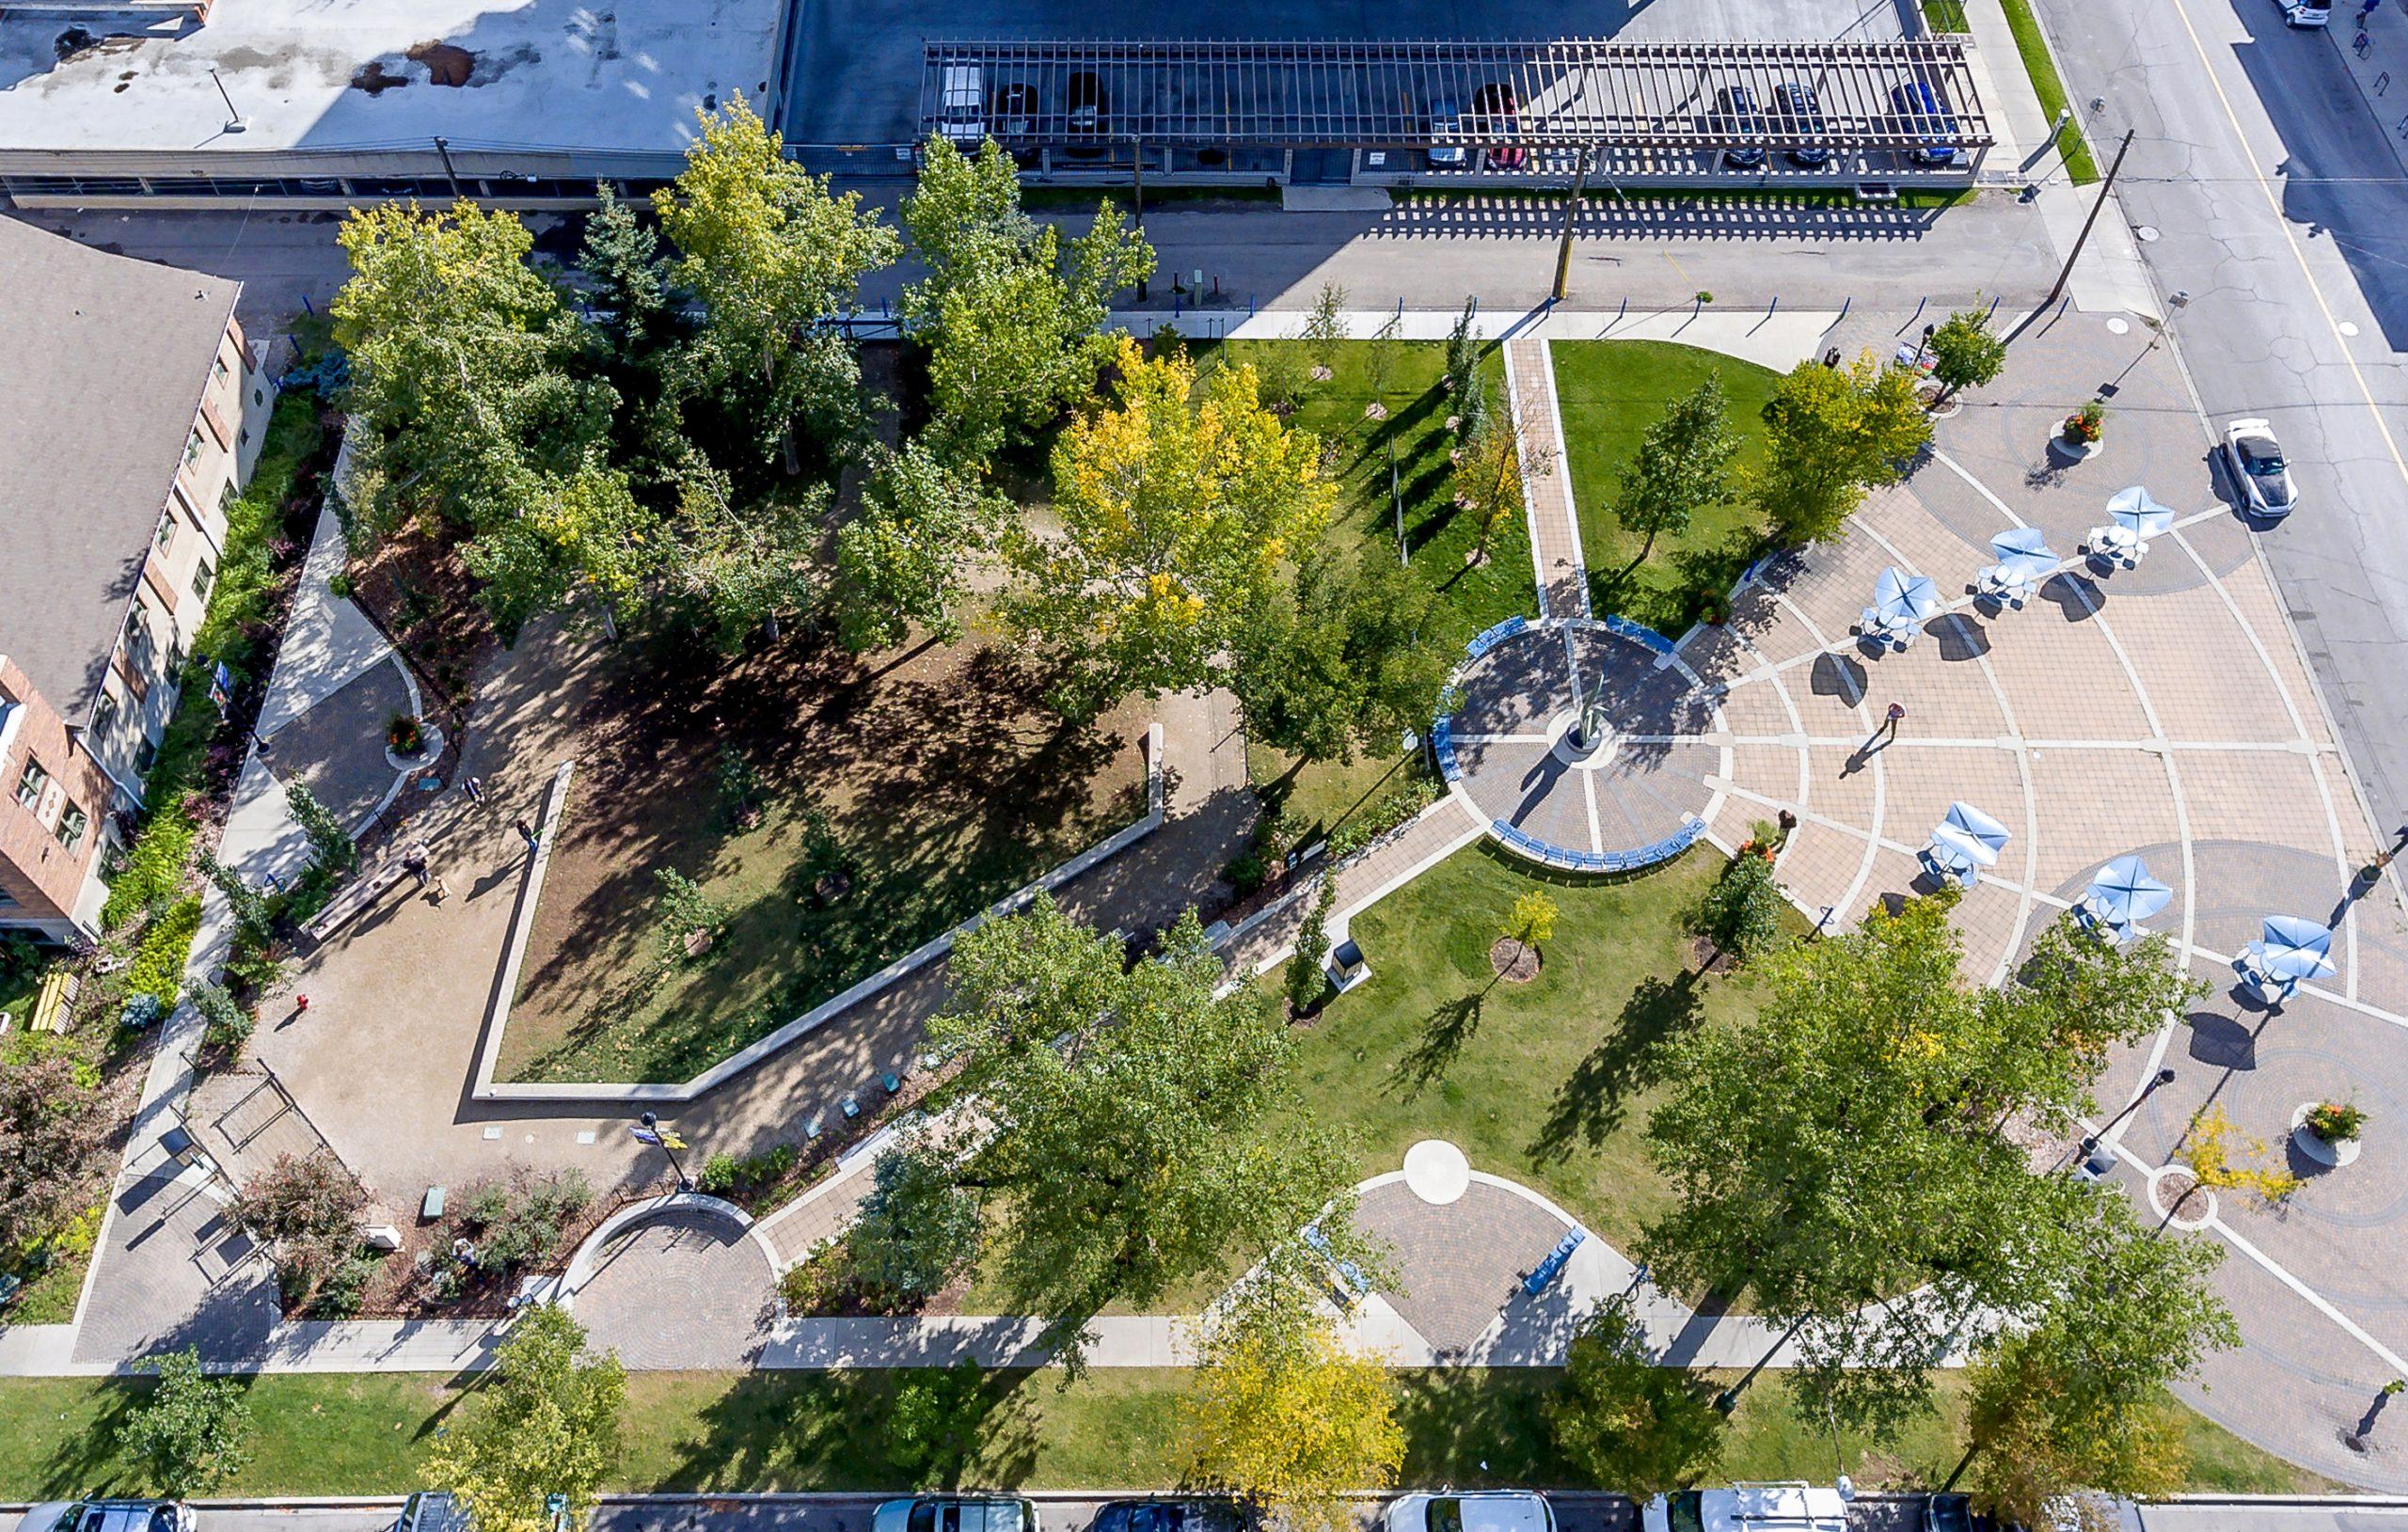 818 Design - Connaught Dog Park